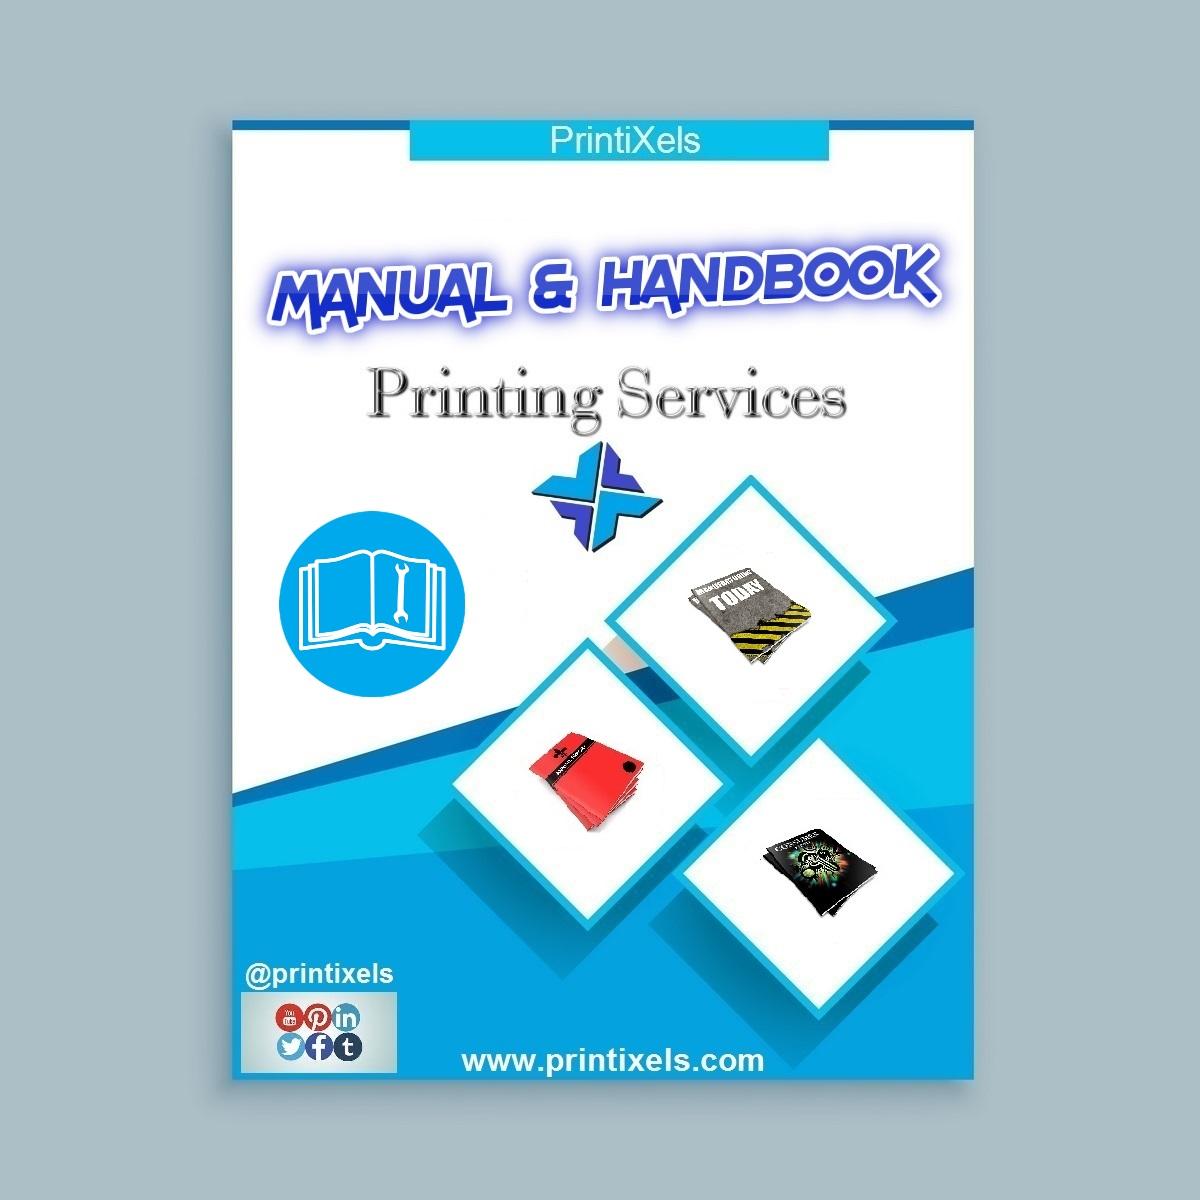 Manual handbook printing services printixels philippines